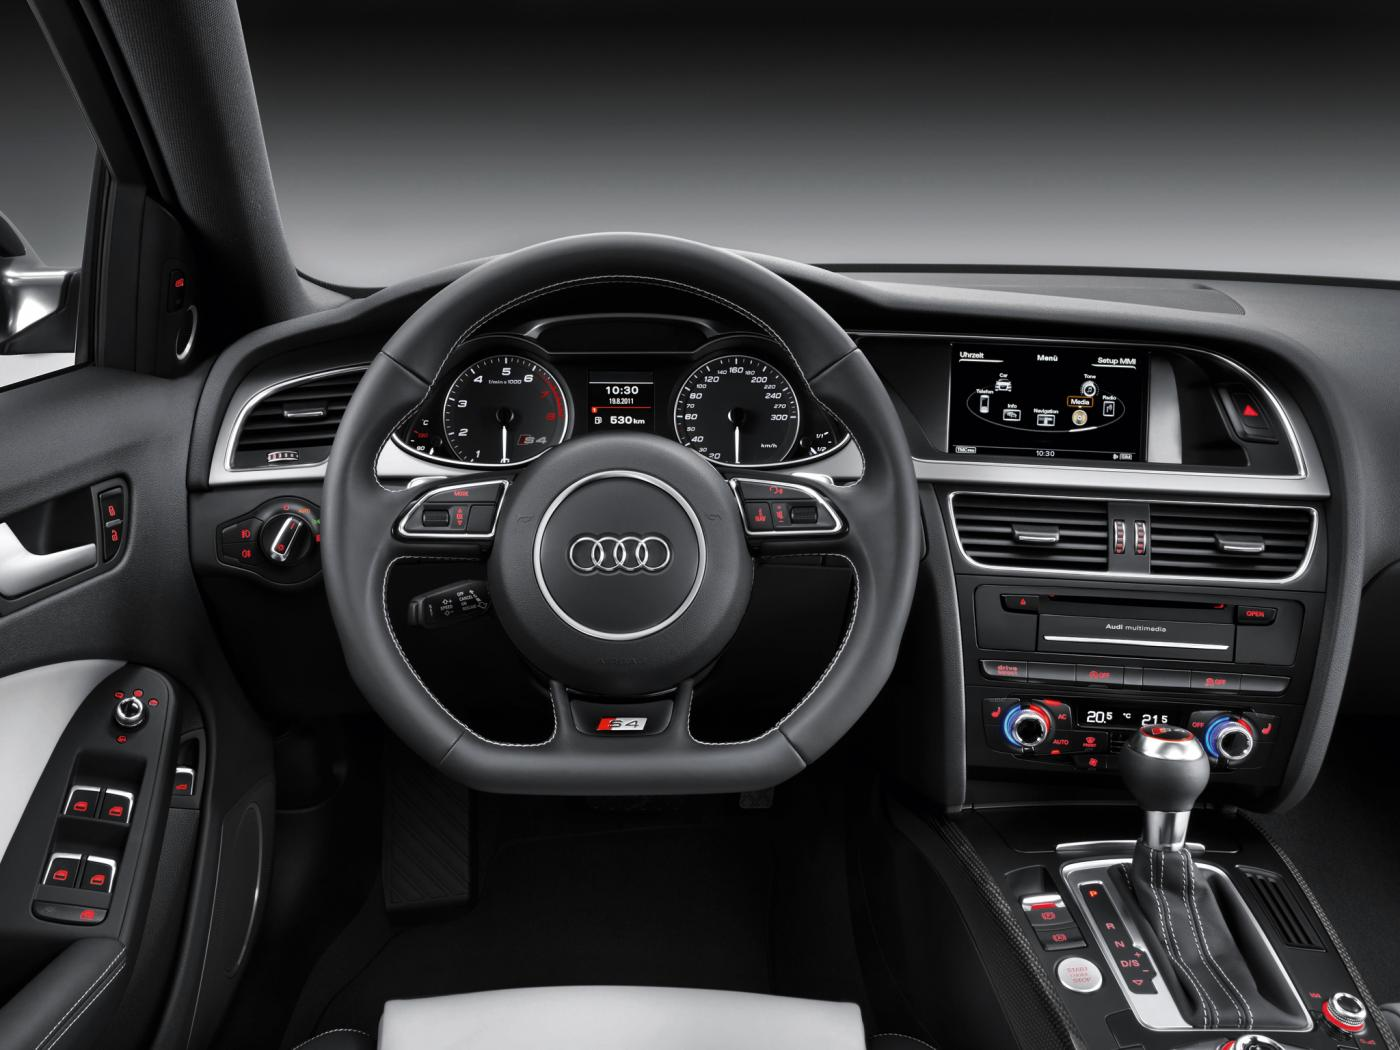 Audi-S4-B8-4